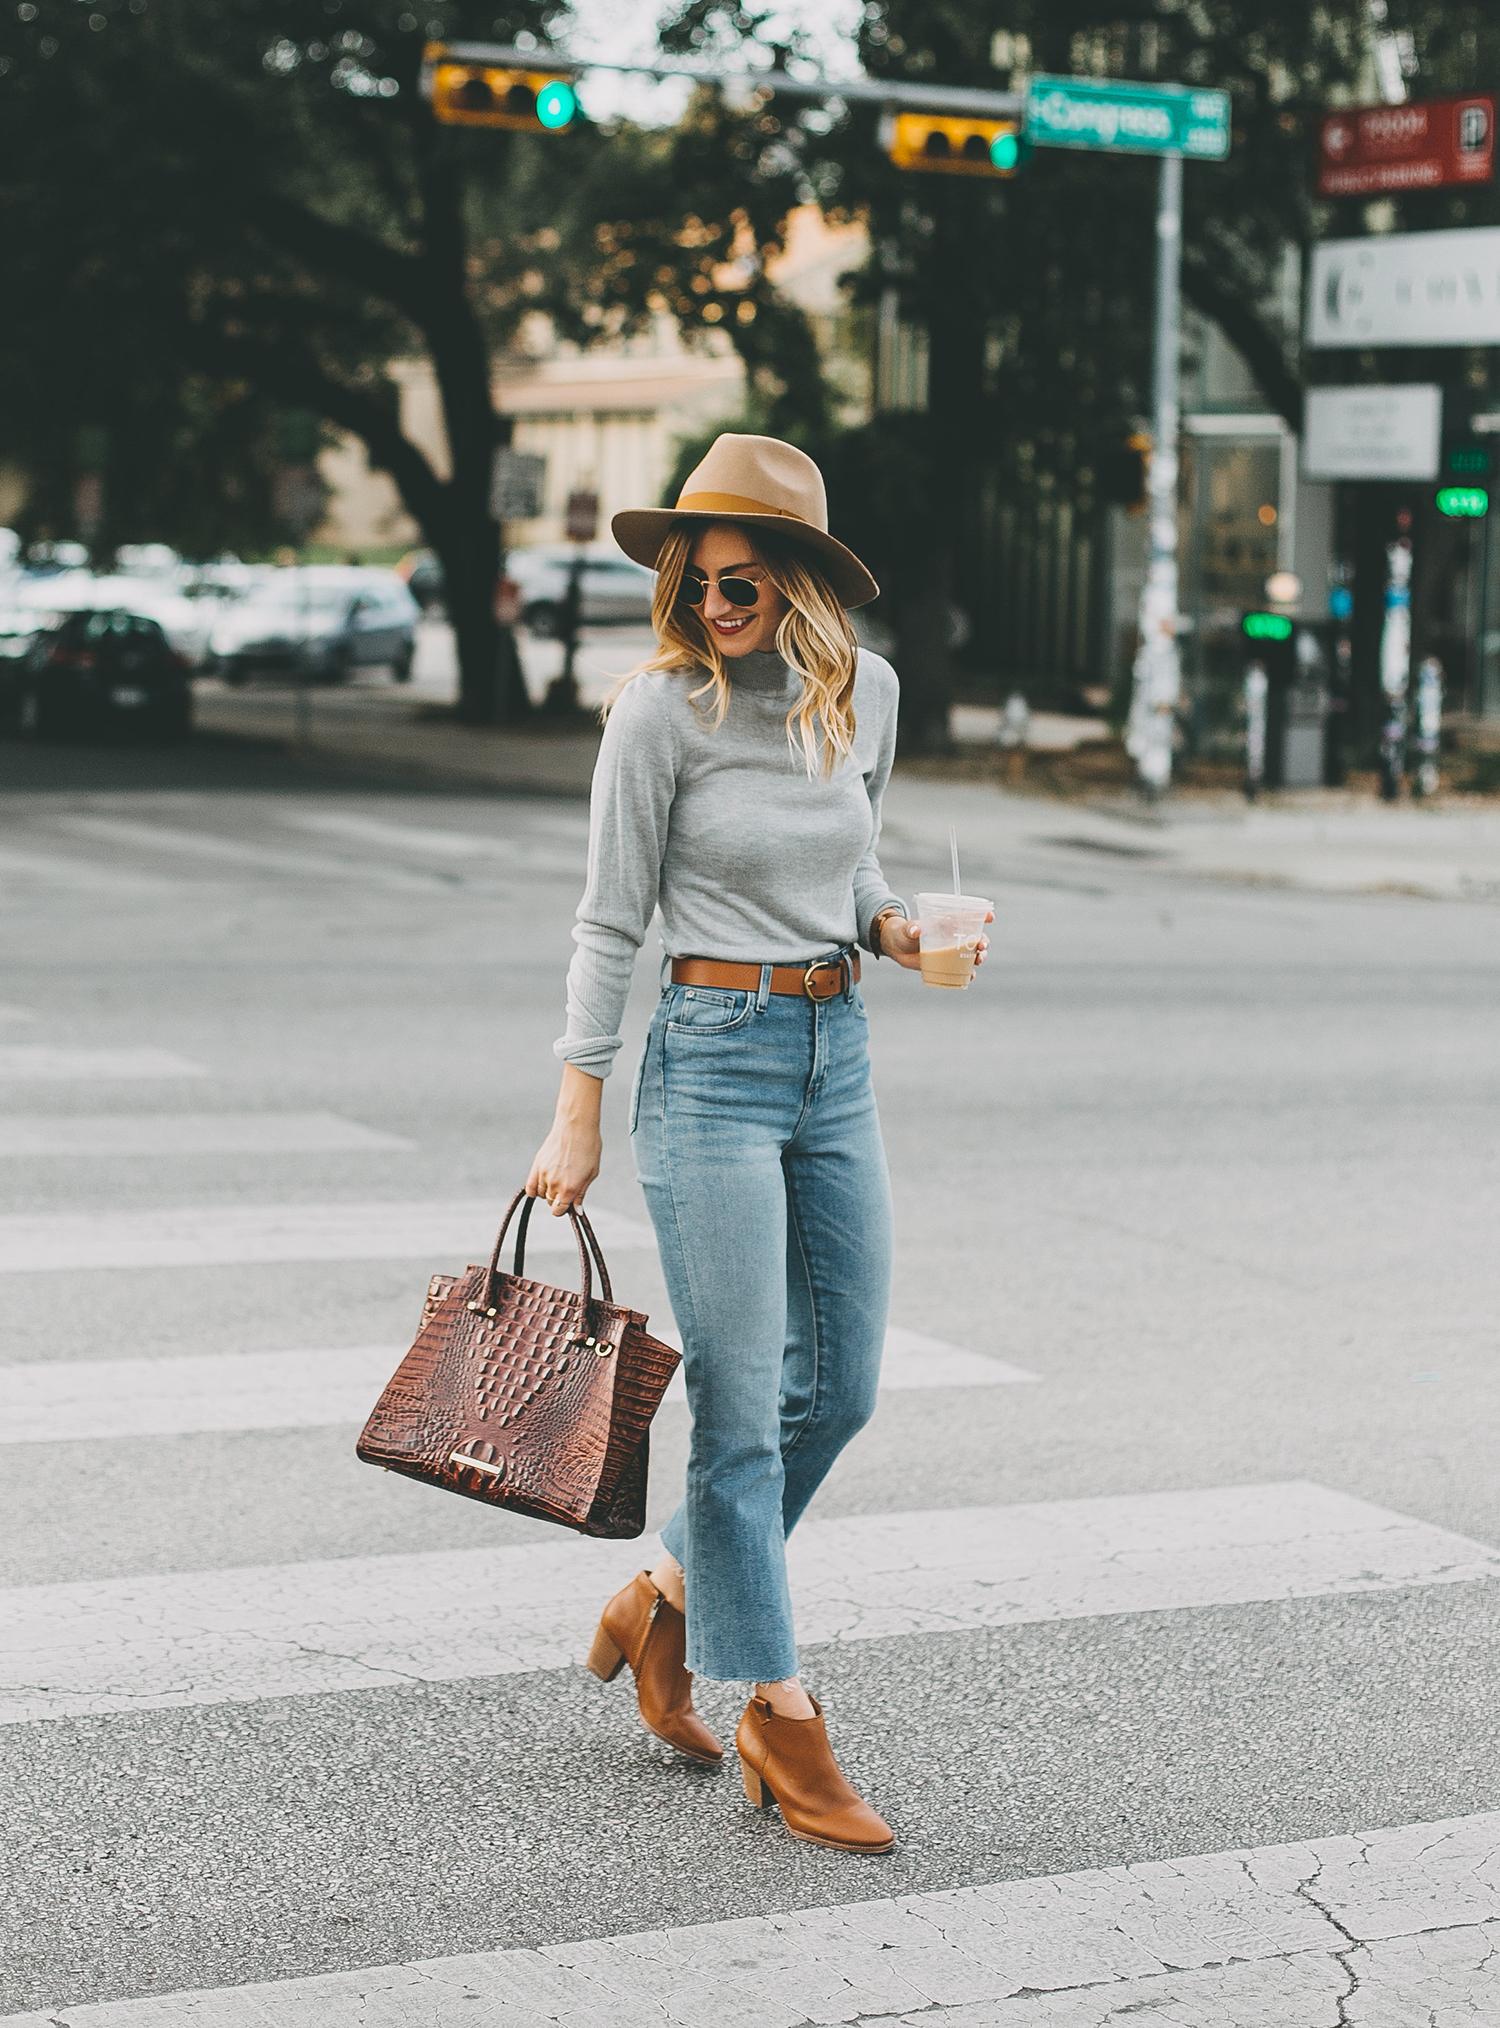 livvyland-blog-olivia-watson-south-congress-avenue-austin-texas-fashion-life-style-blogger-bdg-high-waist-crop-flare-jeans-9